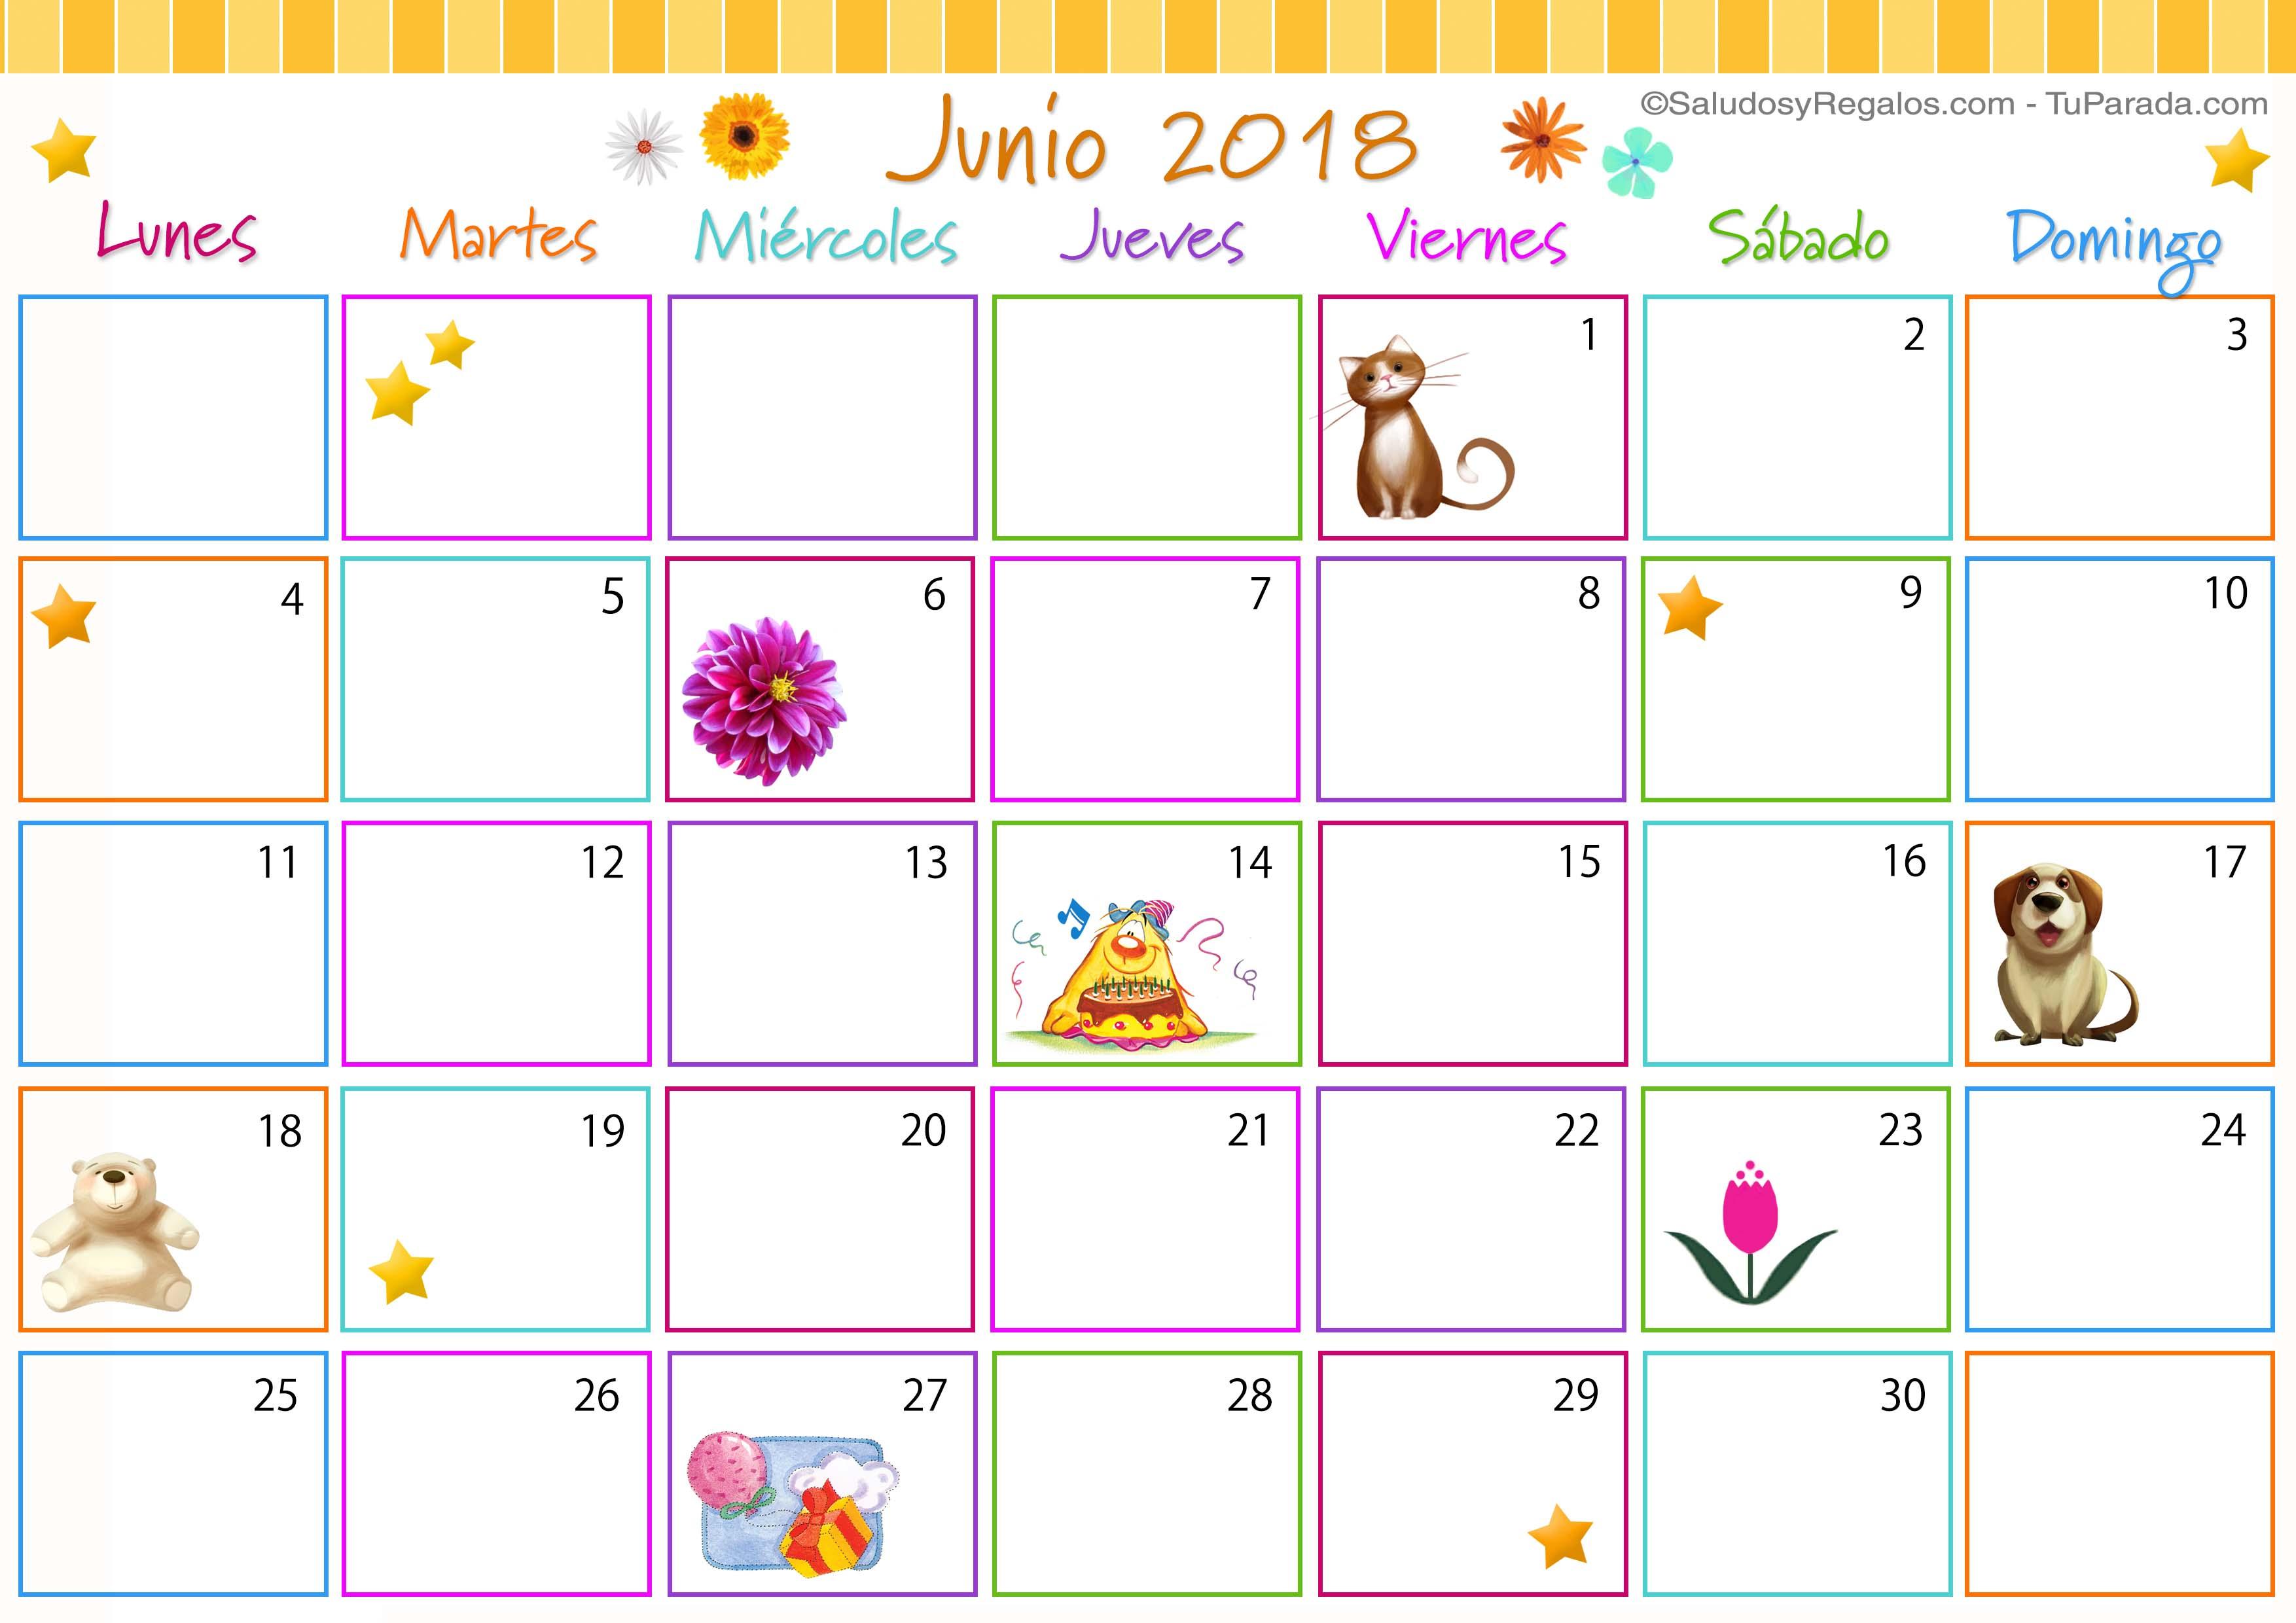 Calendario Junio 2018 Con Festivos